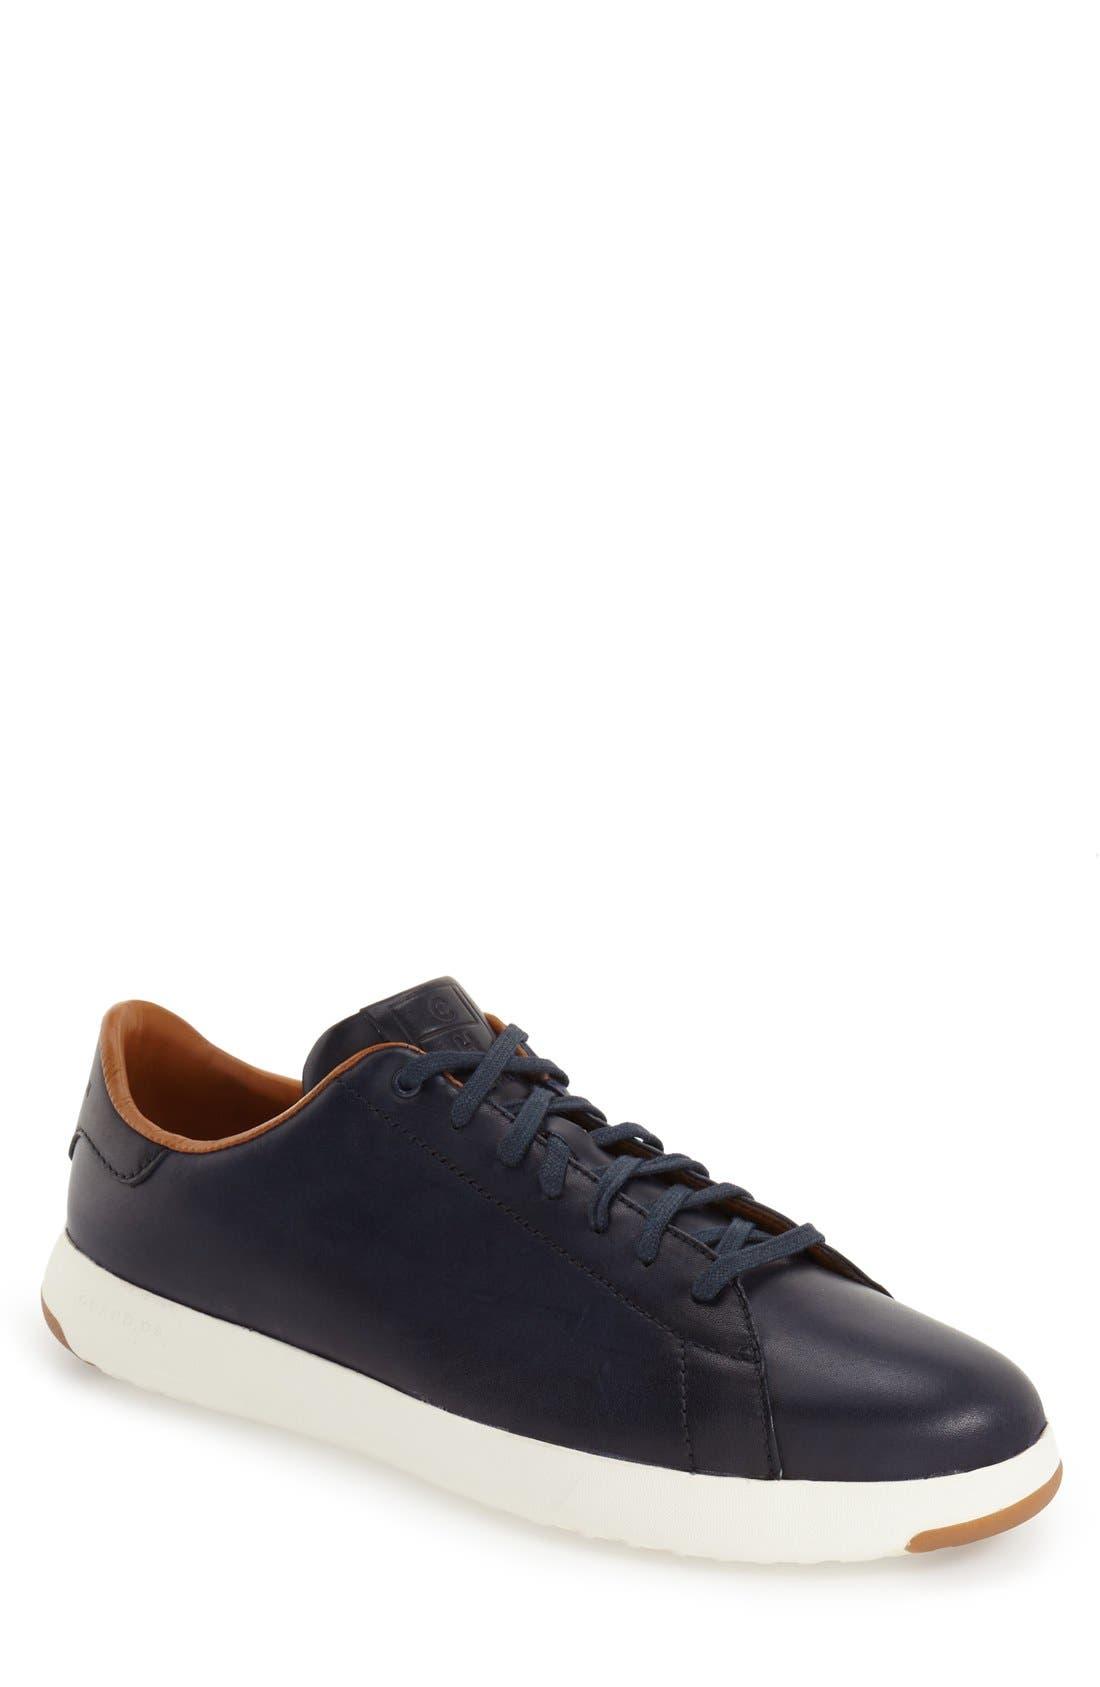 Grandpro Low Top Sneaker